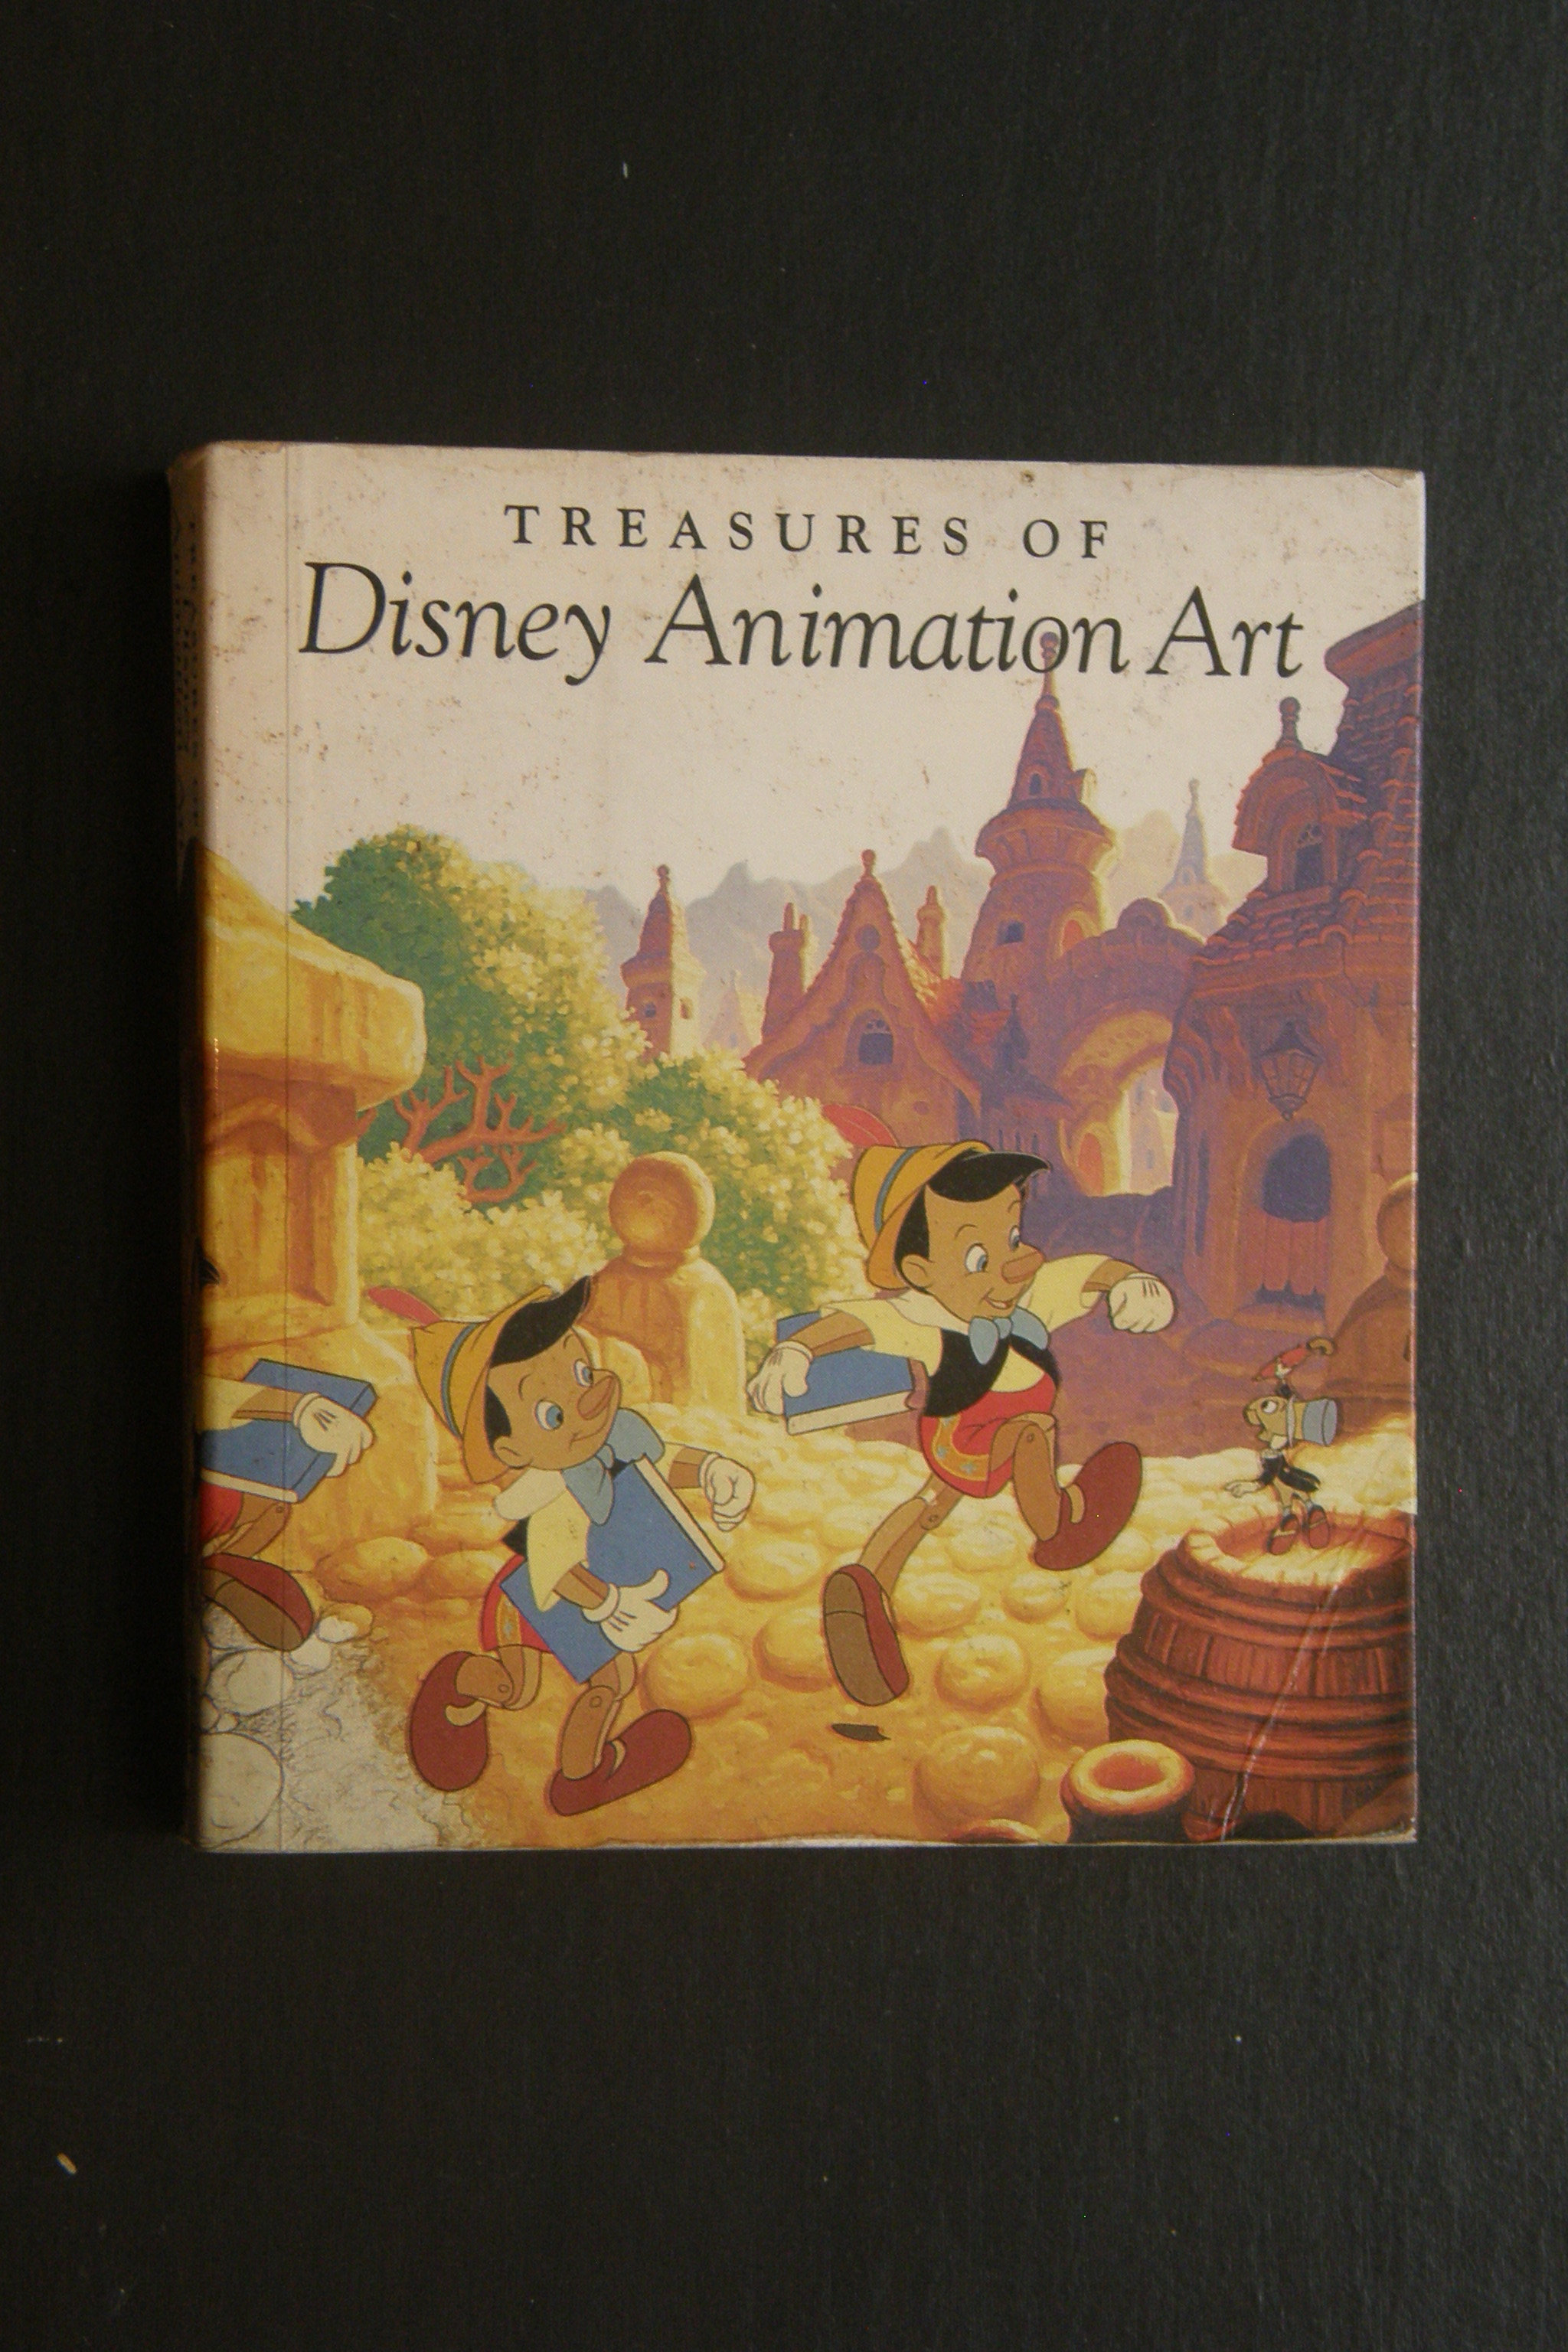 Treasures of Disney Animation Art | the-cheshire-cat